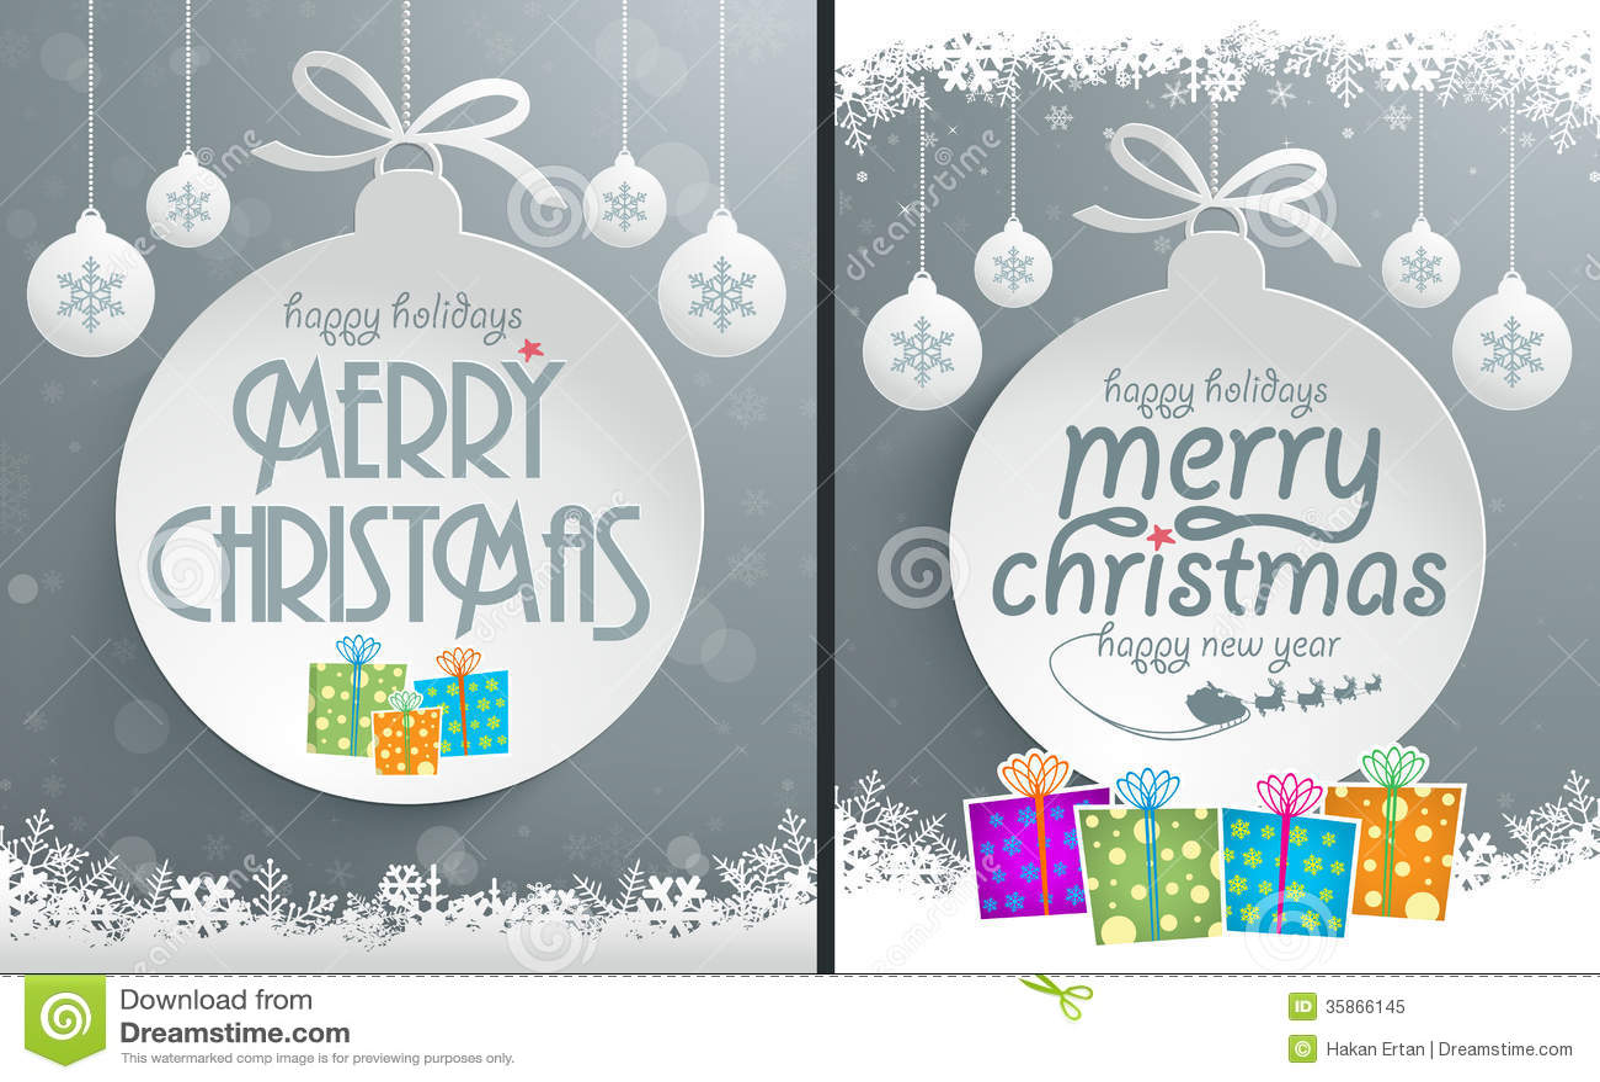 Christmas Message Design Royalty Free Stock Photo Image